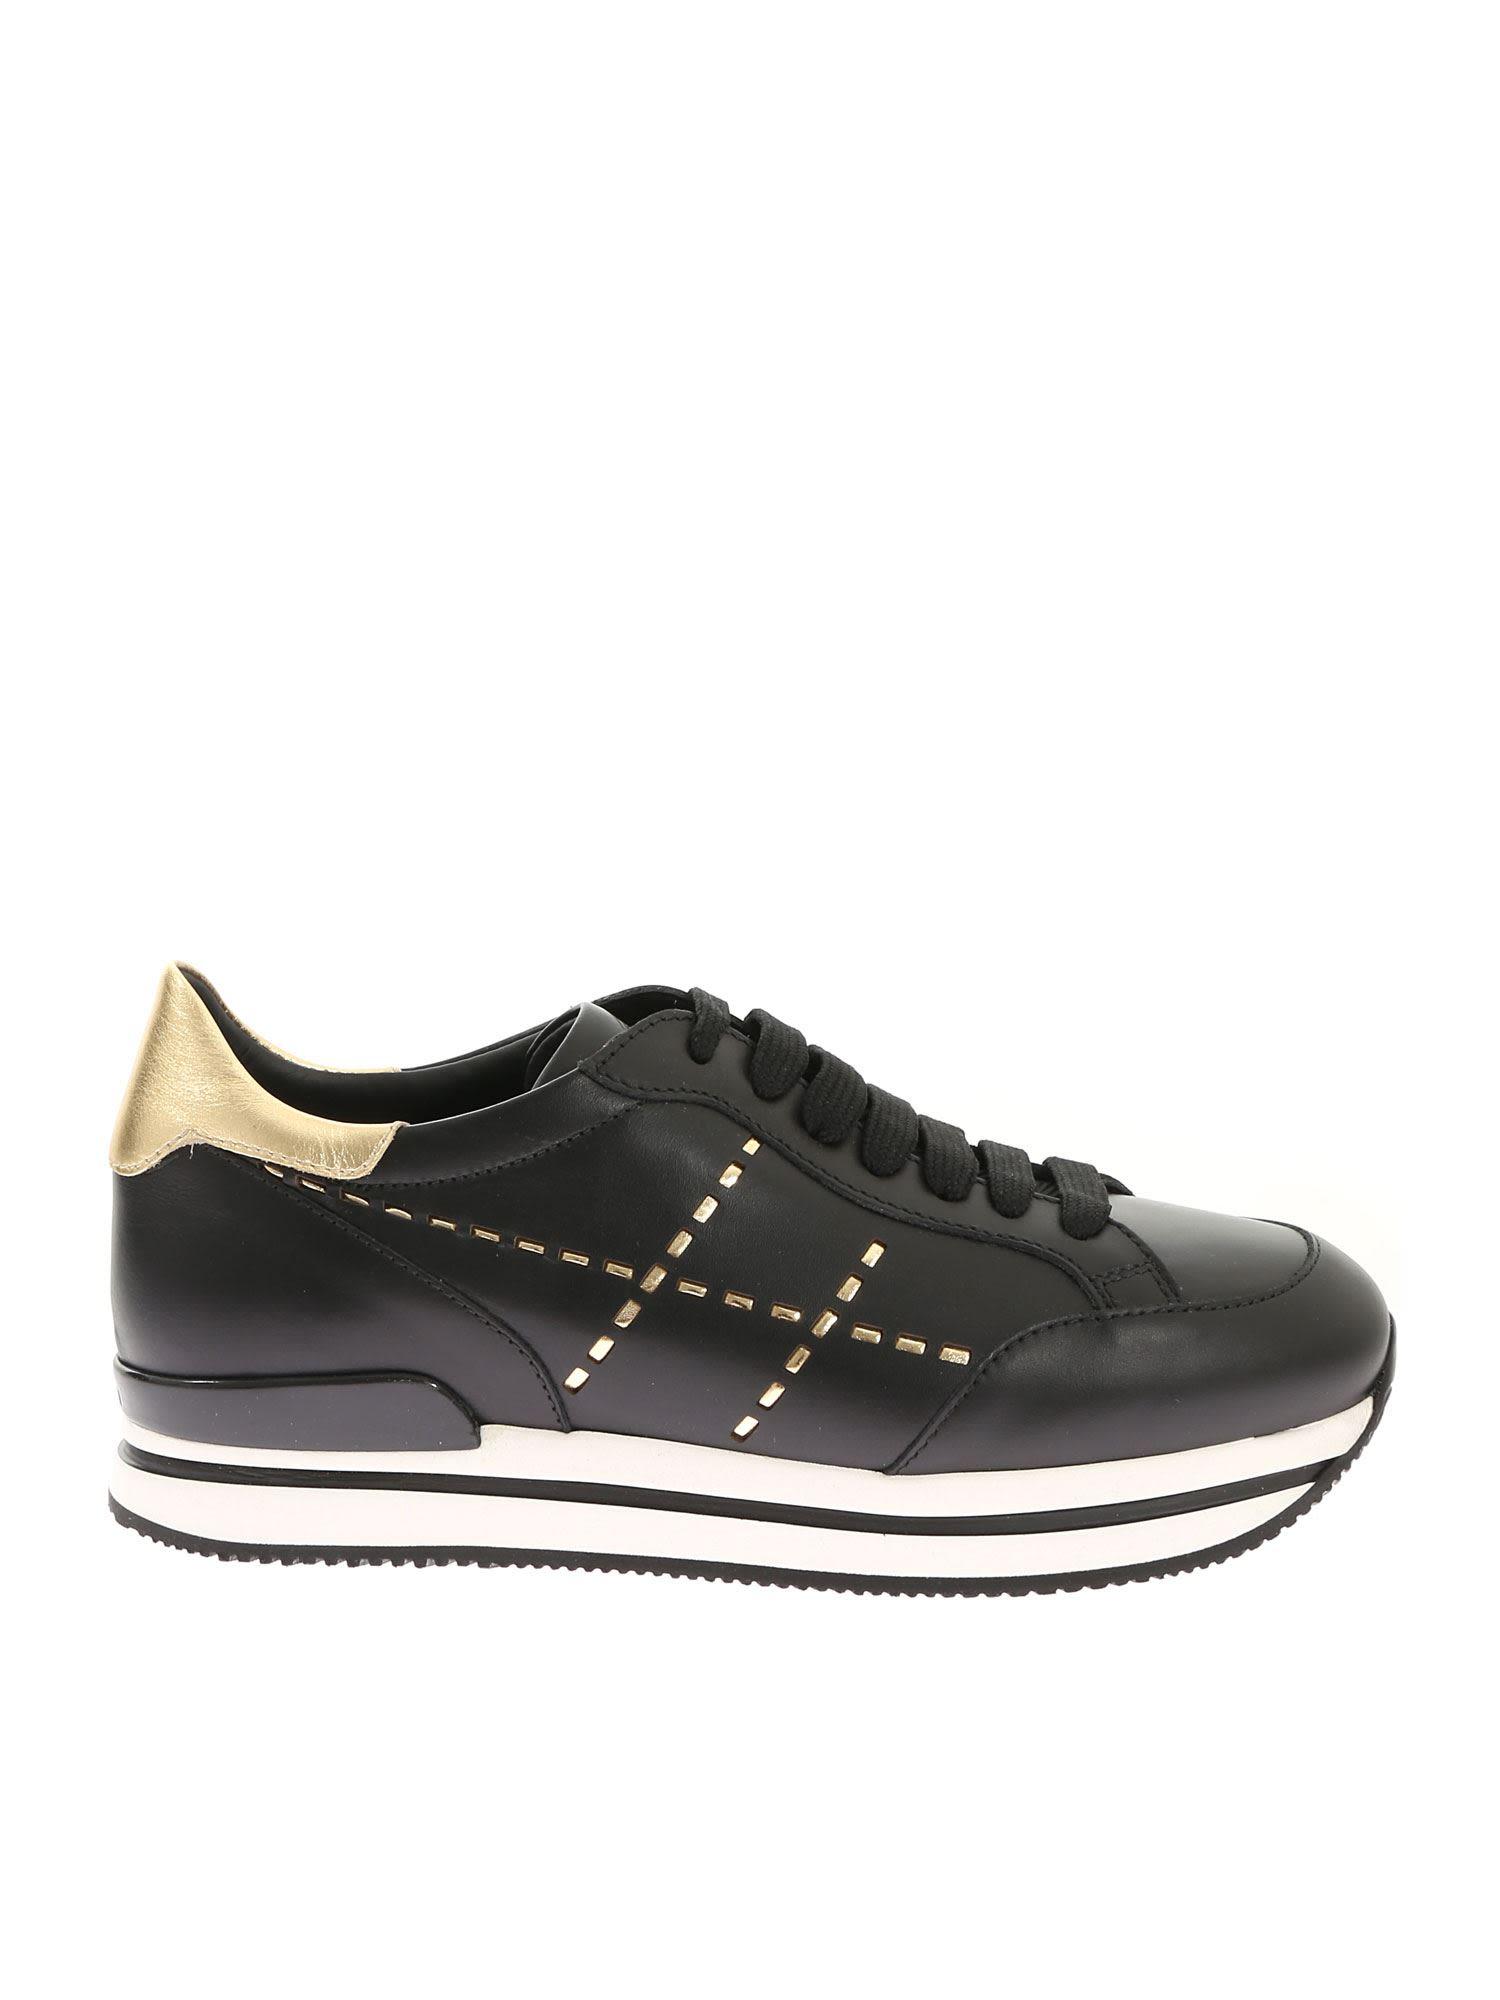 Hogan Metallic Detail Sneakers